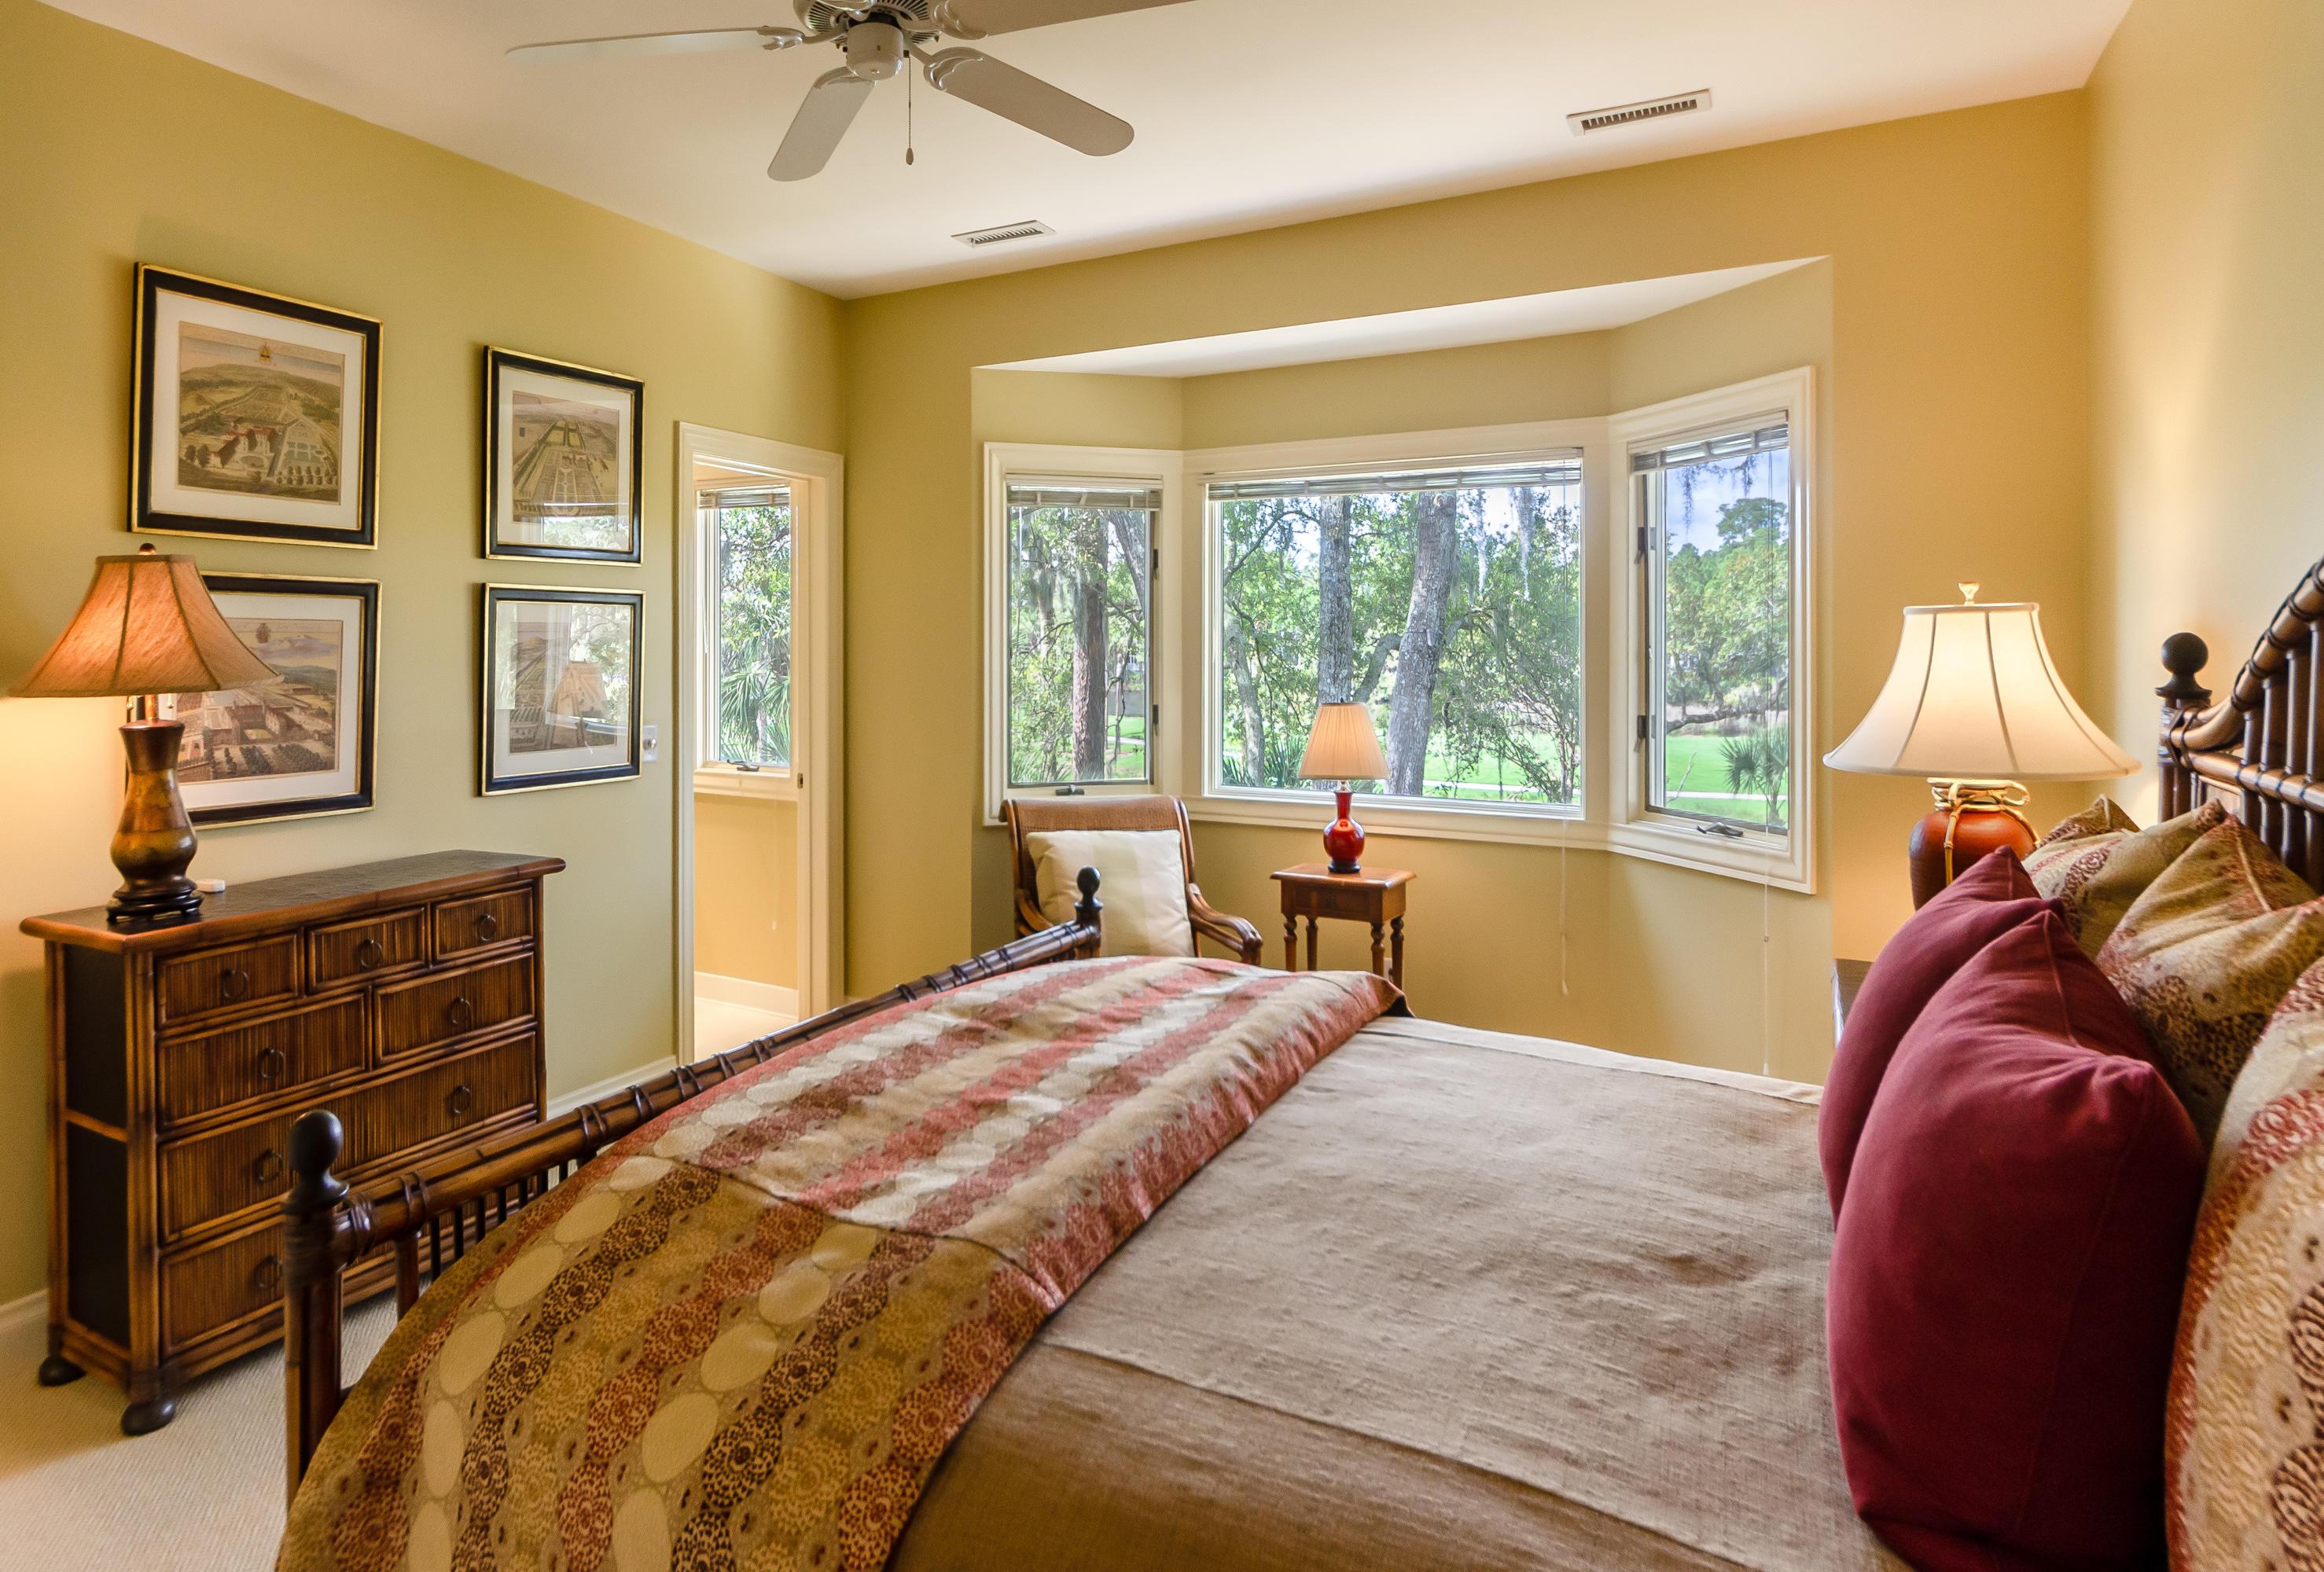 Kiawah Island Homes For Sale - 7 Avocet, Kiawah Island, SC - 22